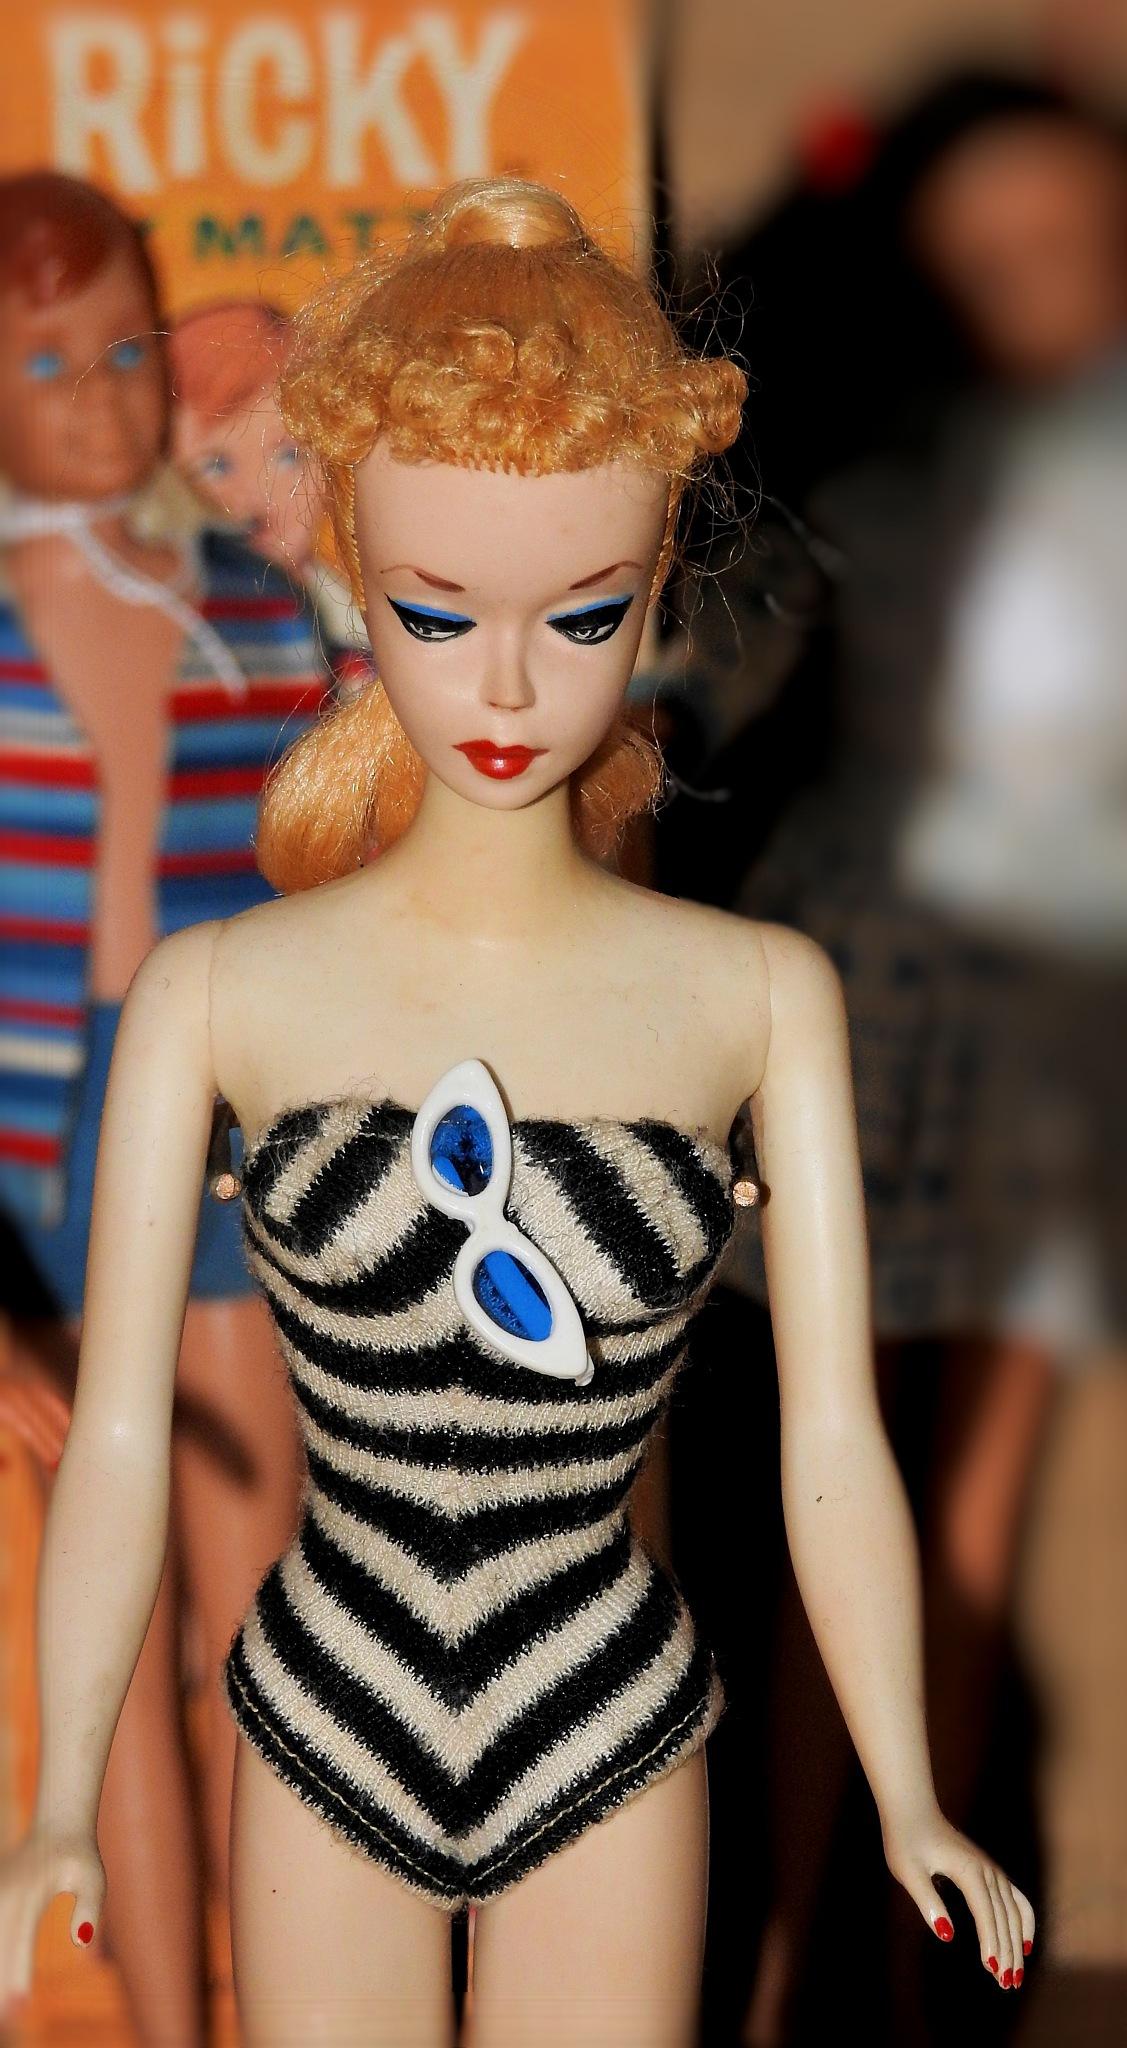 NAPOLI - STORIE DI GIOCATTOLI DAL SETTECENTO A BARBIE - Happy Day, Barbie's Family! - 2 by Arnaldo De Lisio